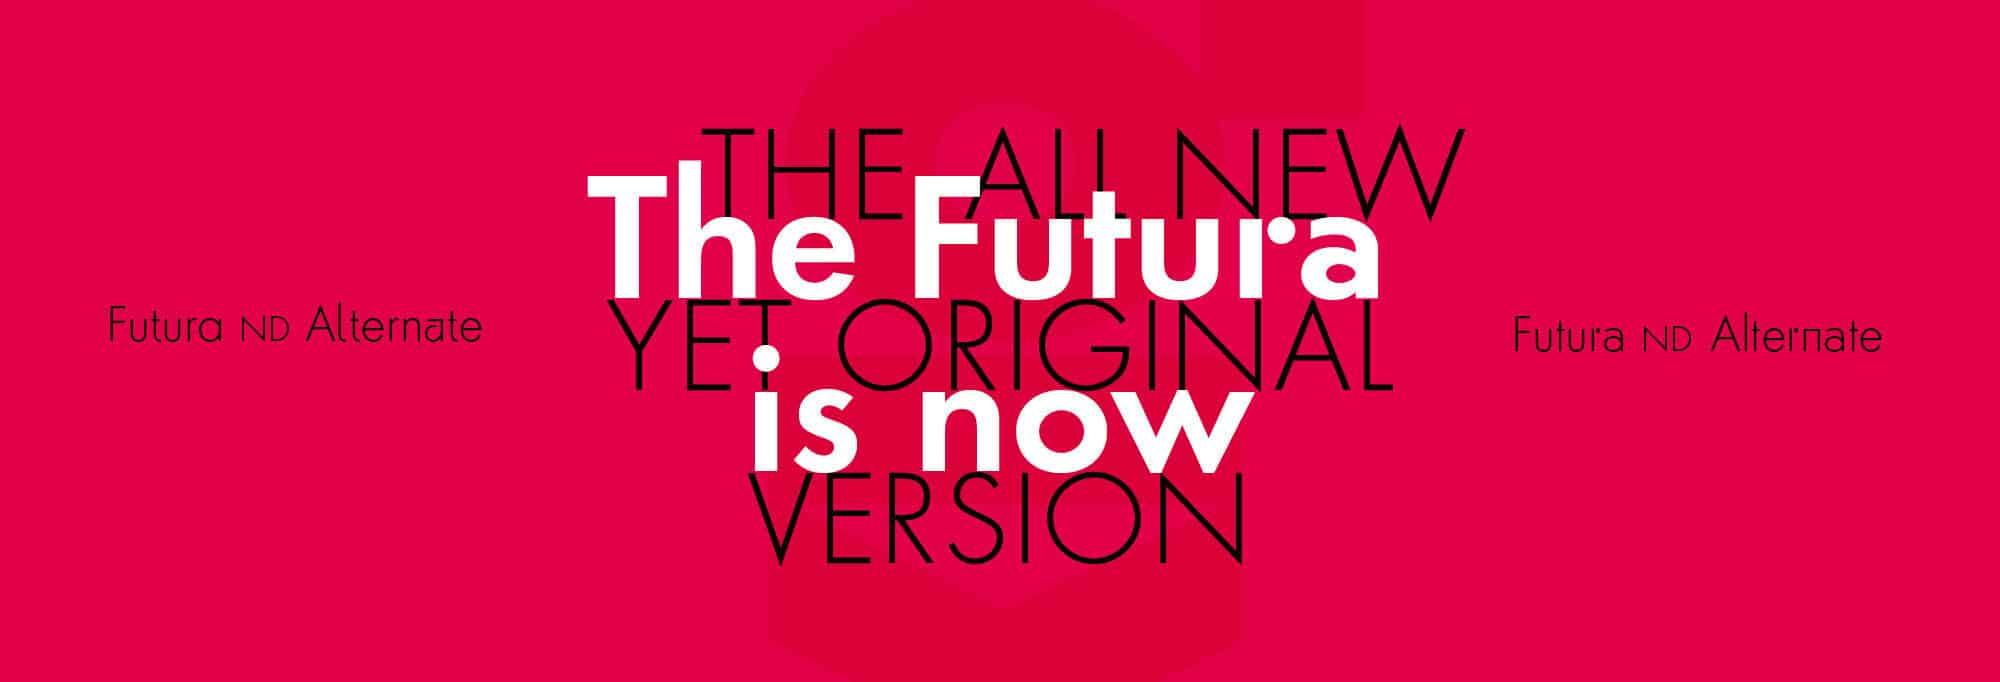 CTV_Futura-ND-Alternate_bauertypes_01-01